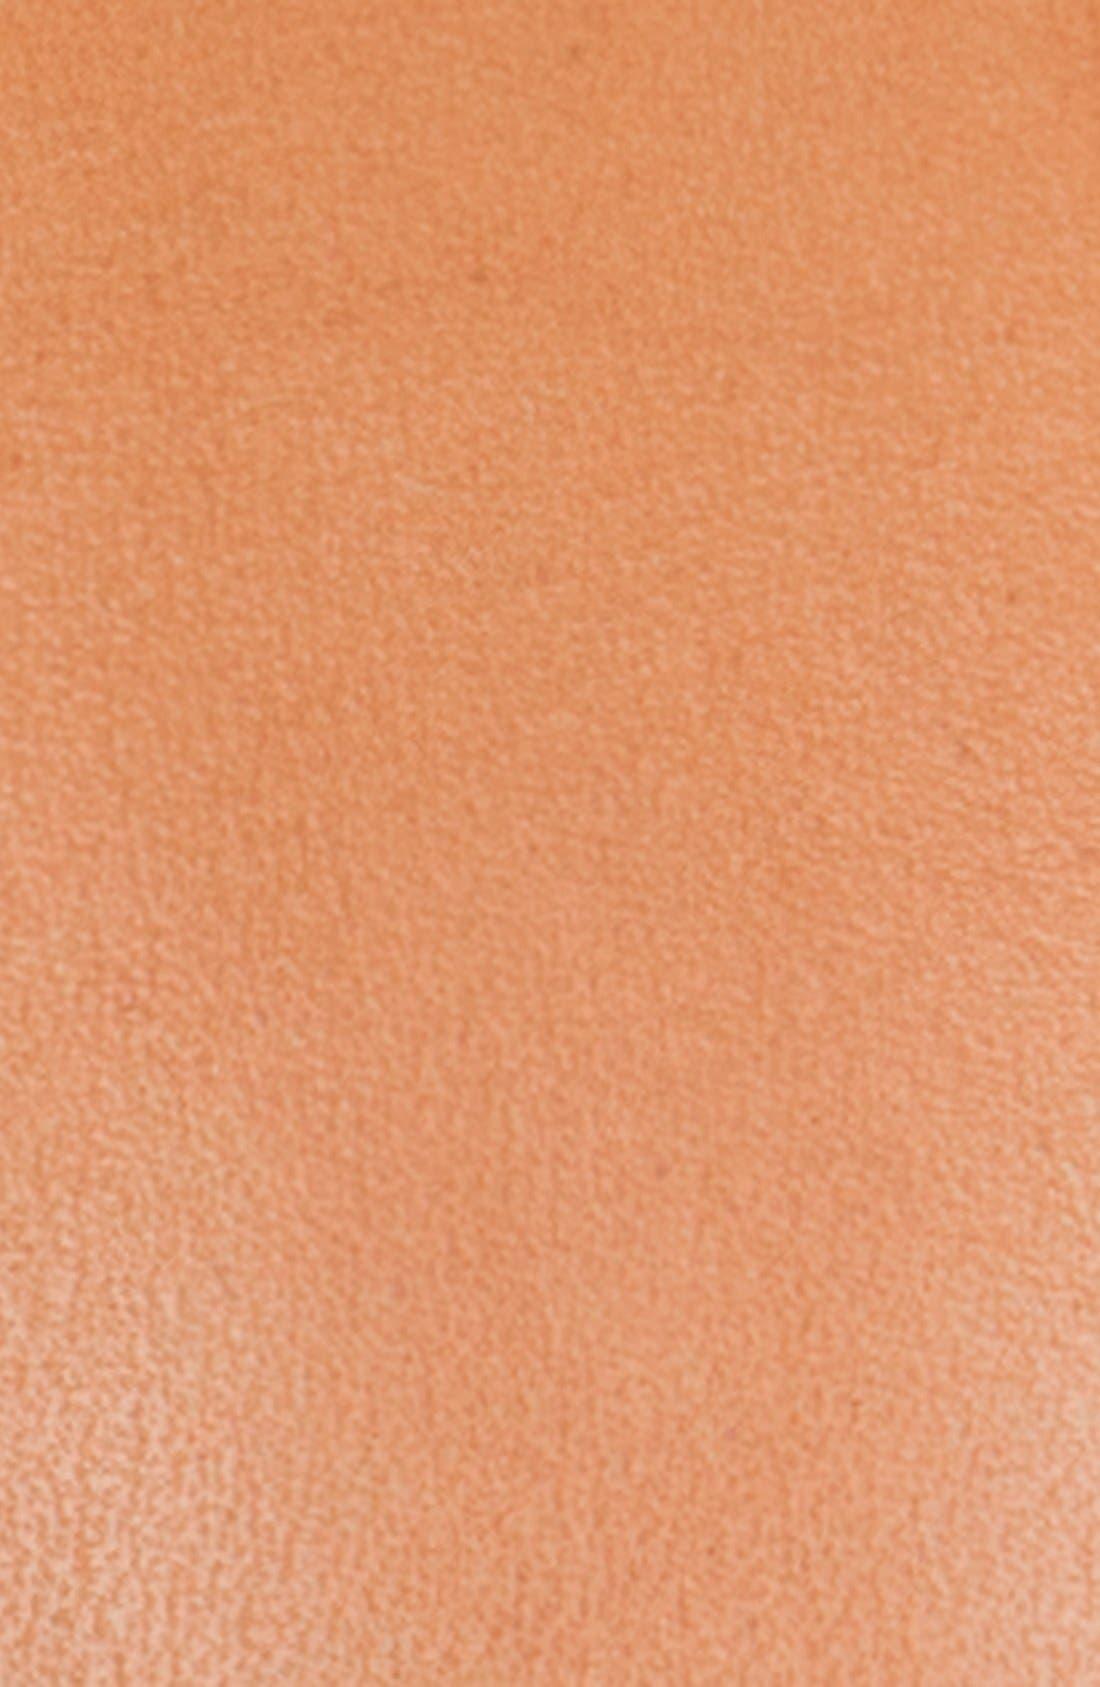 Reversible Hibiscus Print Leather Belt,                             Alternate thumbnail 2, color,                             Tan